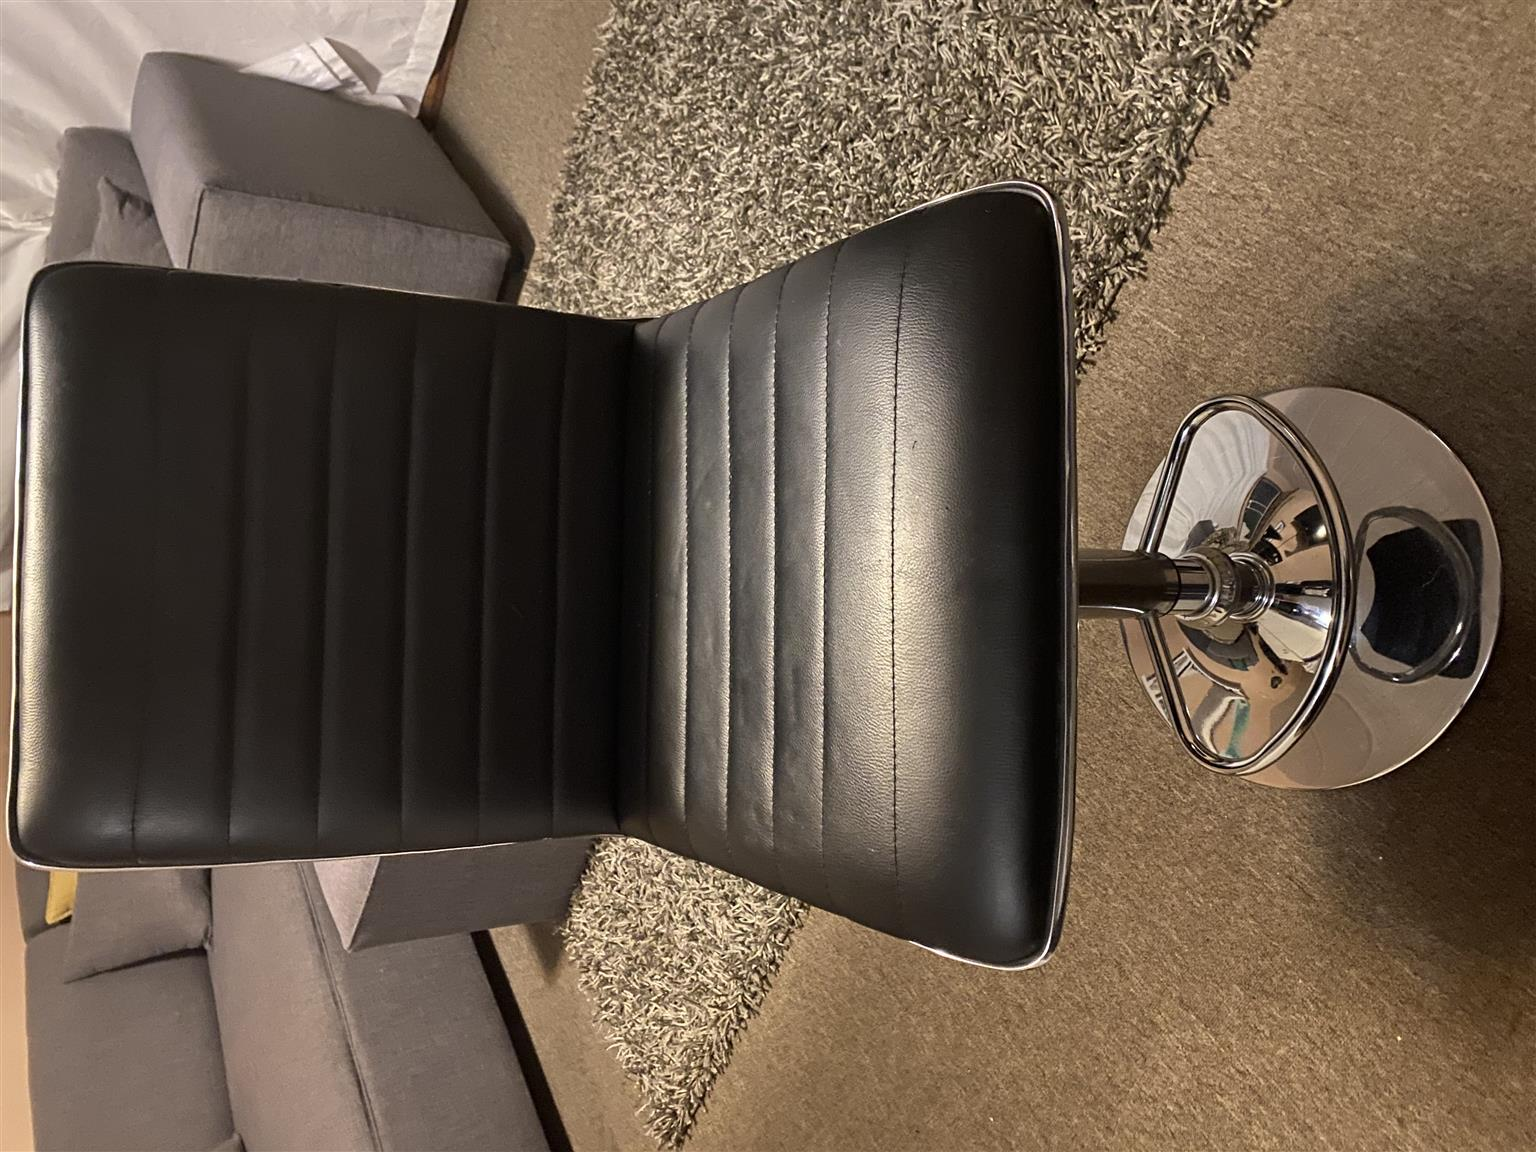 Bar/office chair